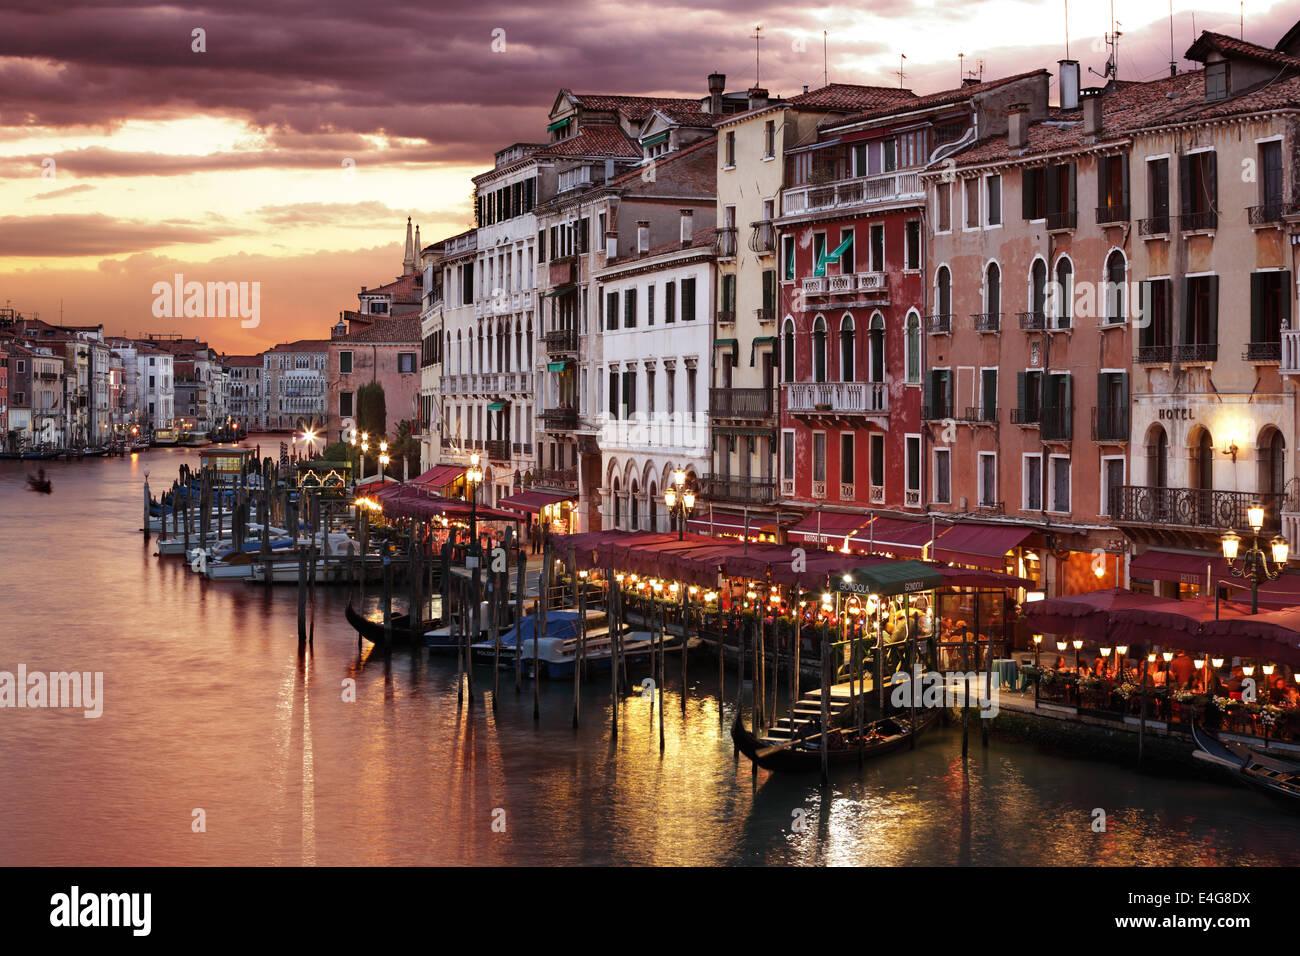 Sul Canal Grande a Venezia di notte Immagini Stock